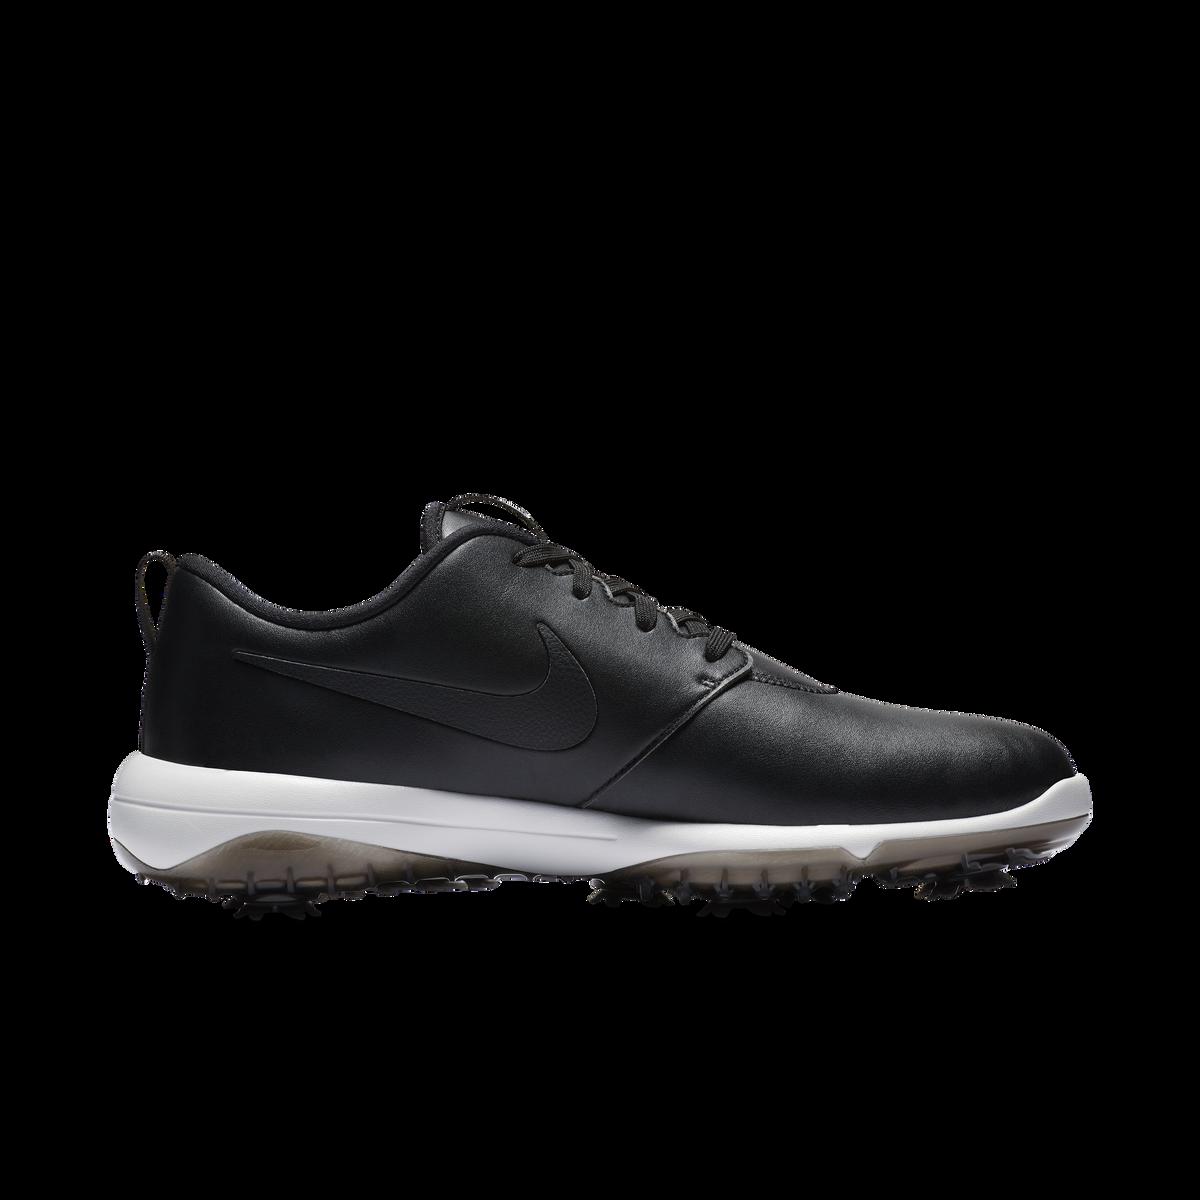 a3033e34a011 Nike Roshe G Tour Men s Golf Shoe - Black